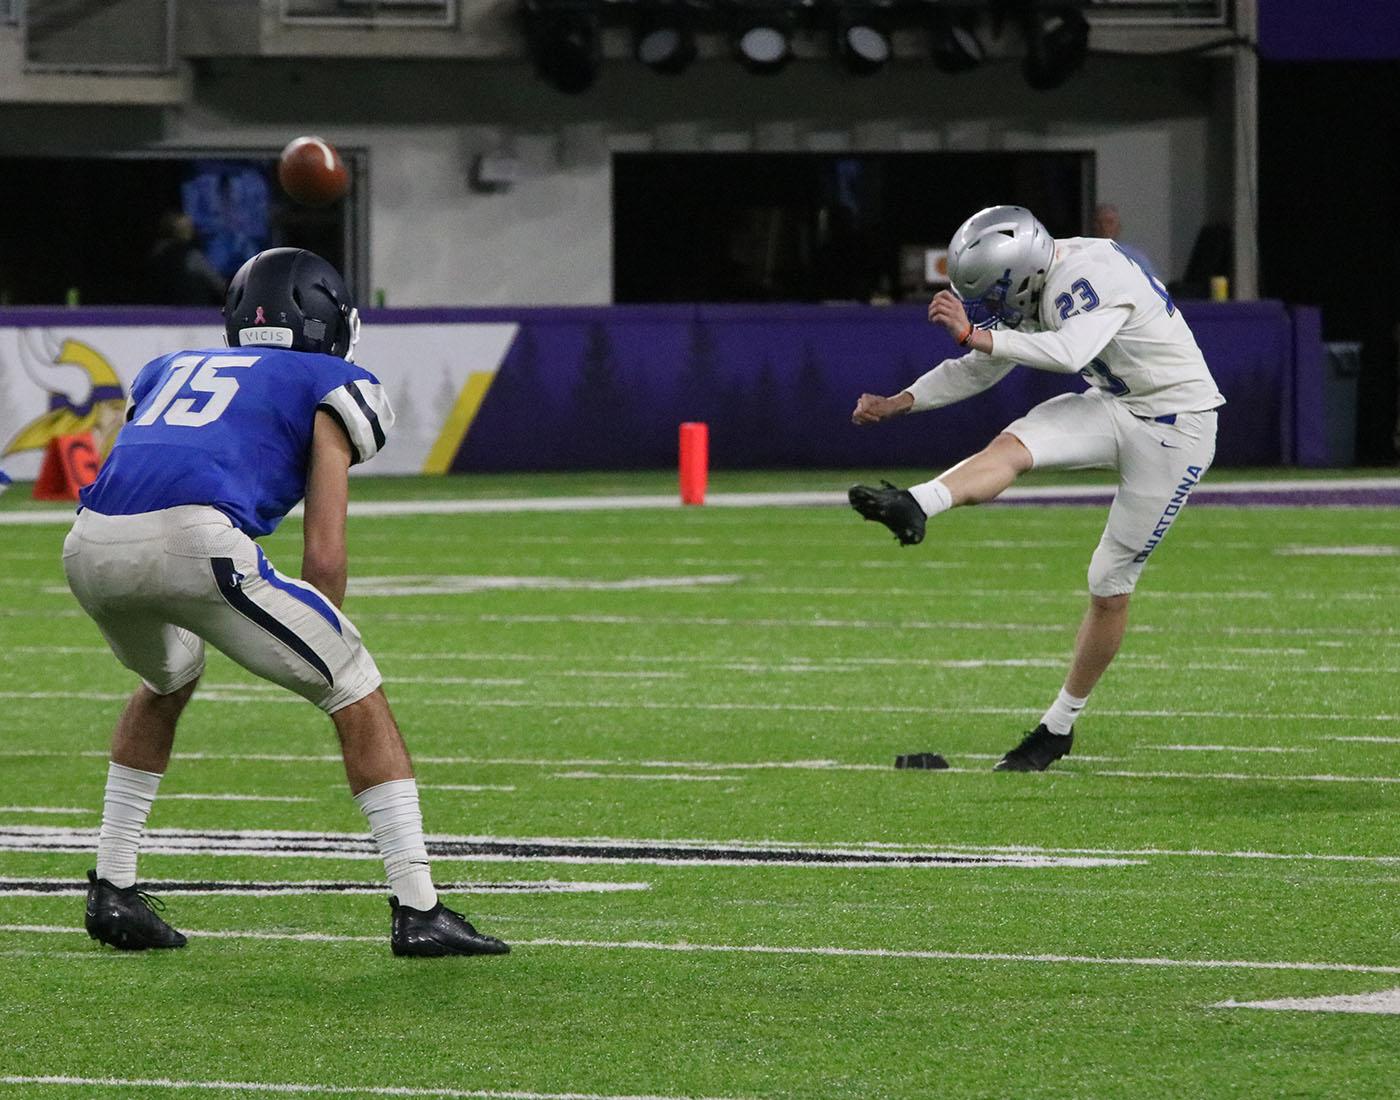 Sam+Hansen+kicking+the+ball